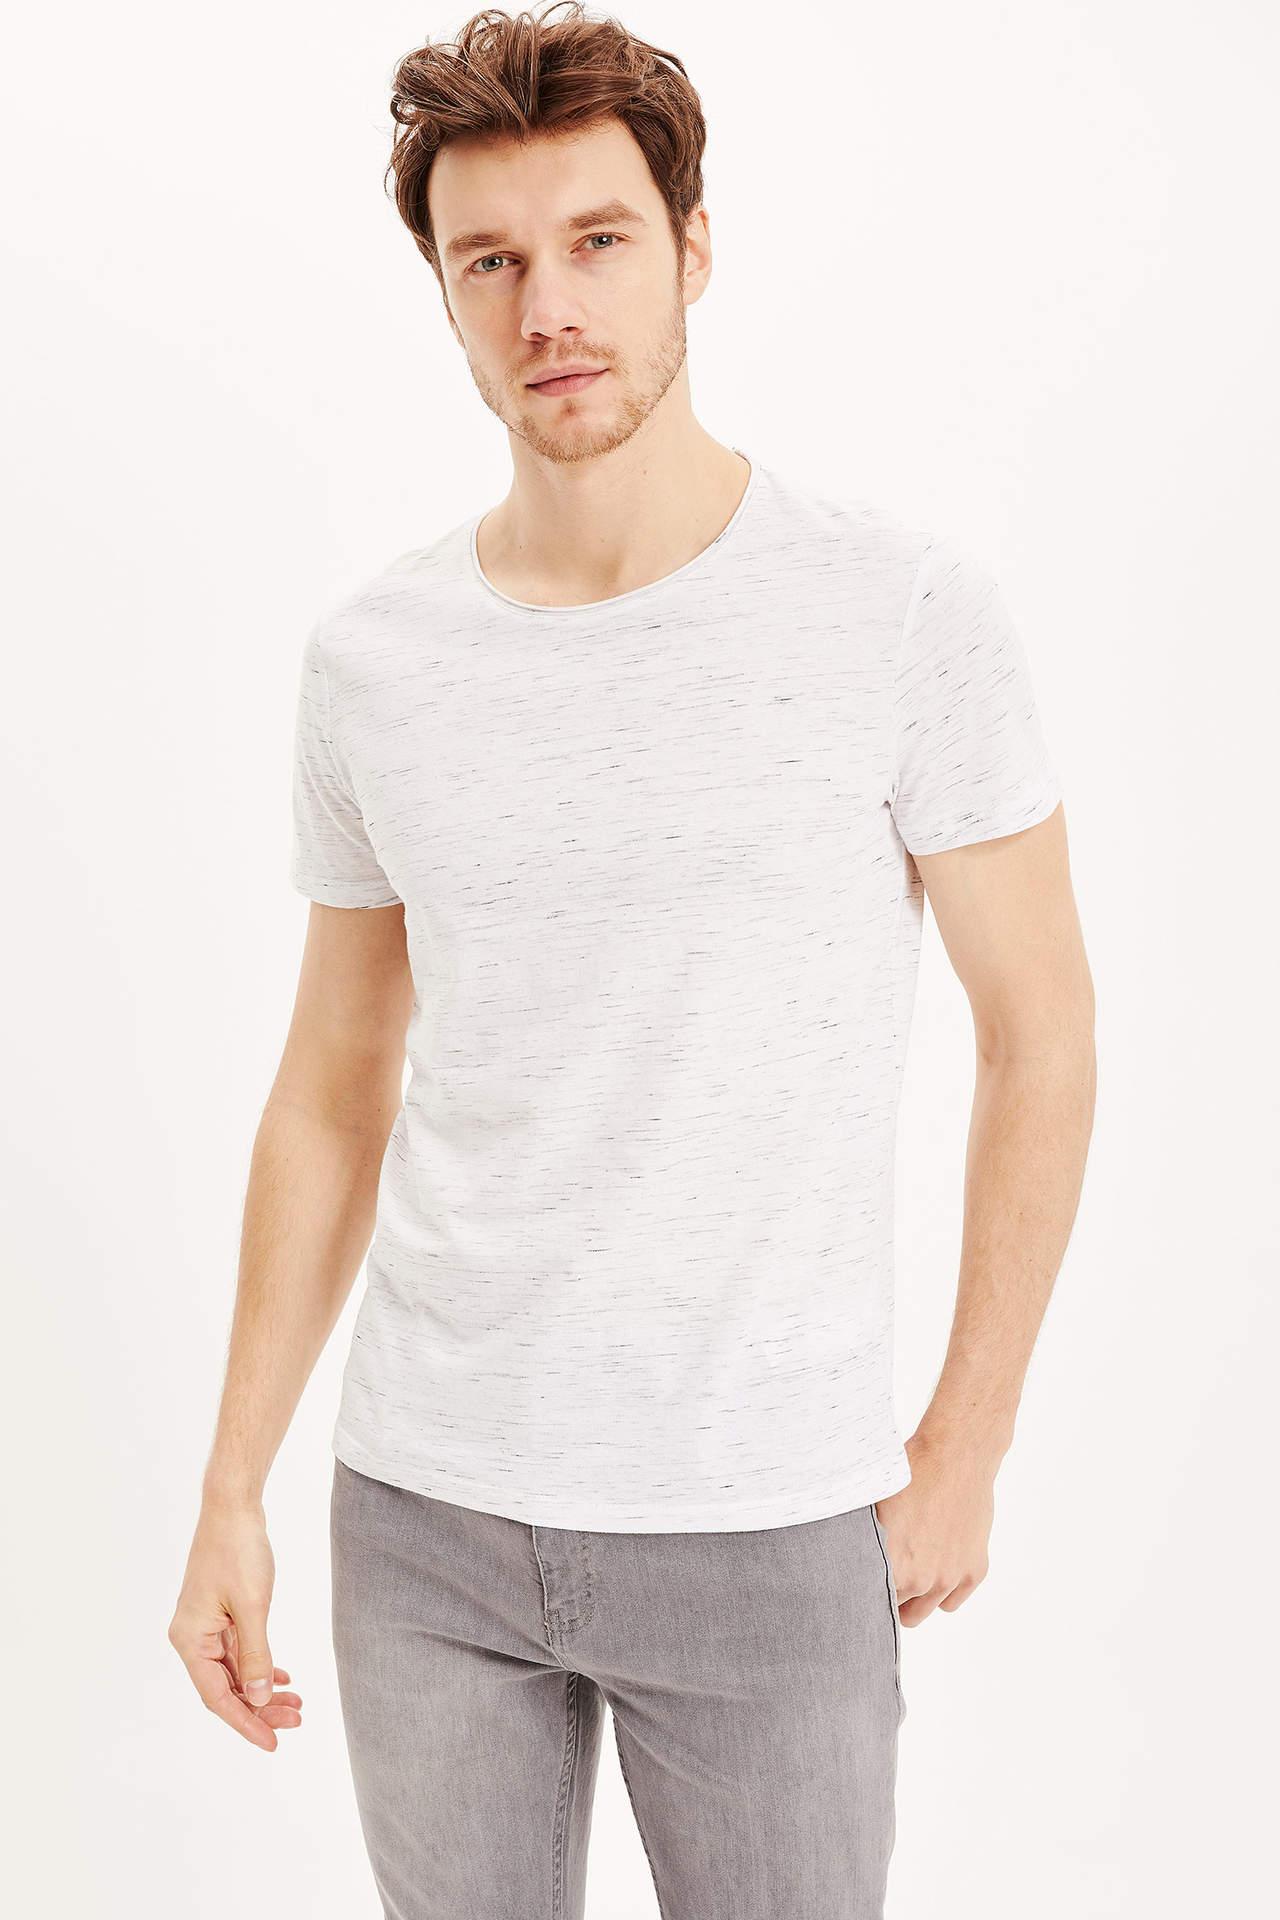 DeFacto Erkek Slim Fit T-Shirt Beyaz male